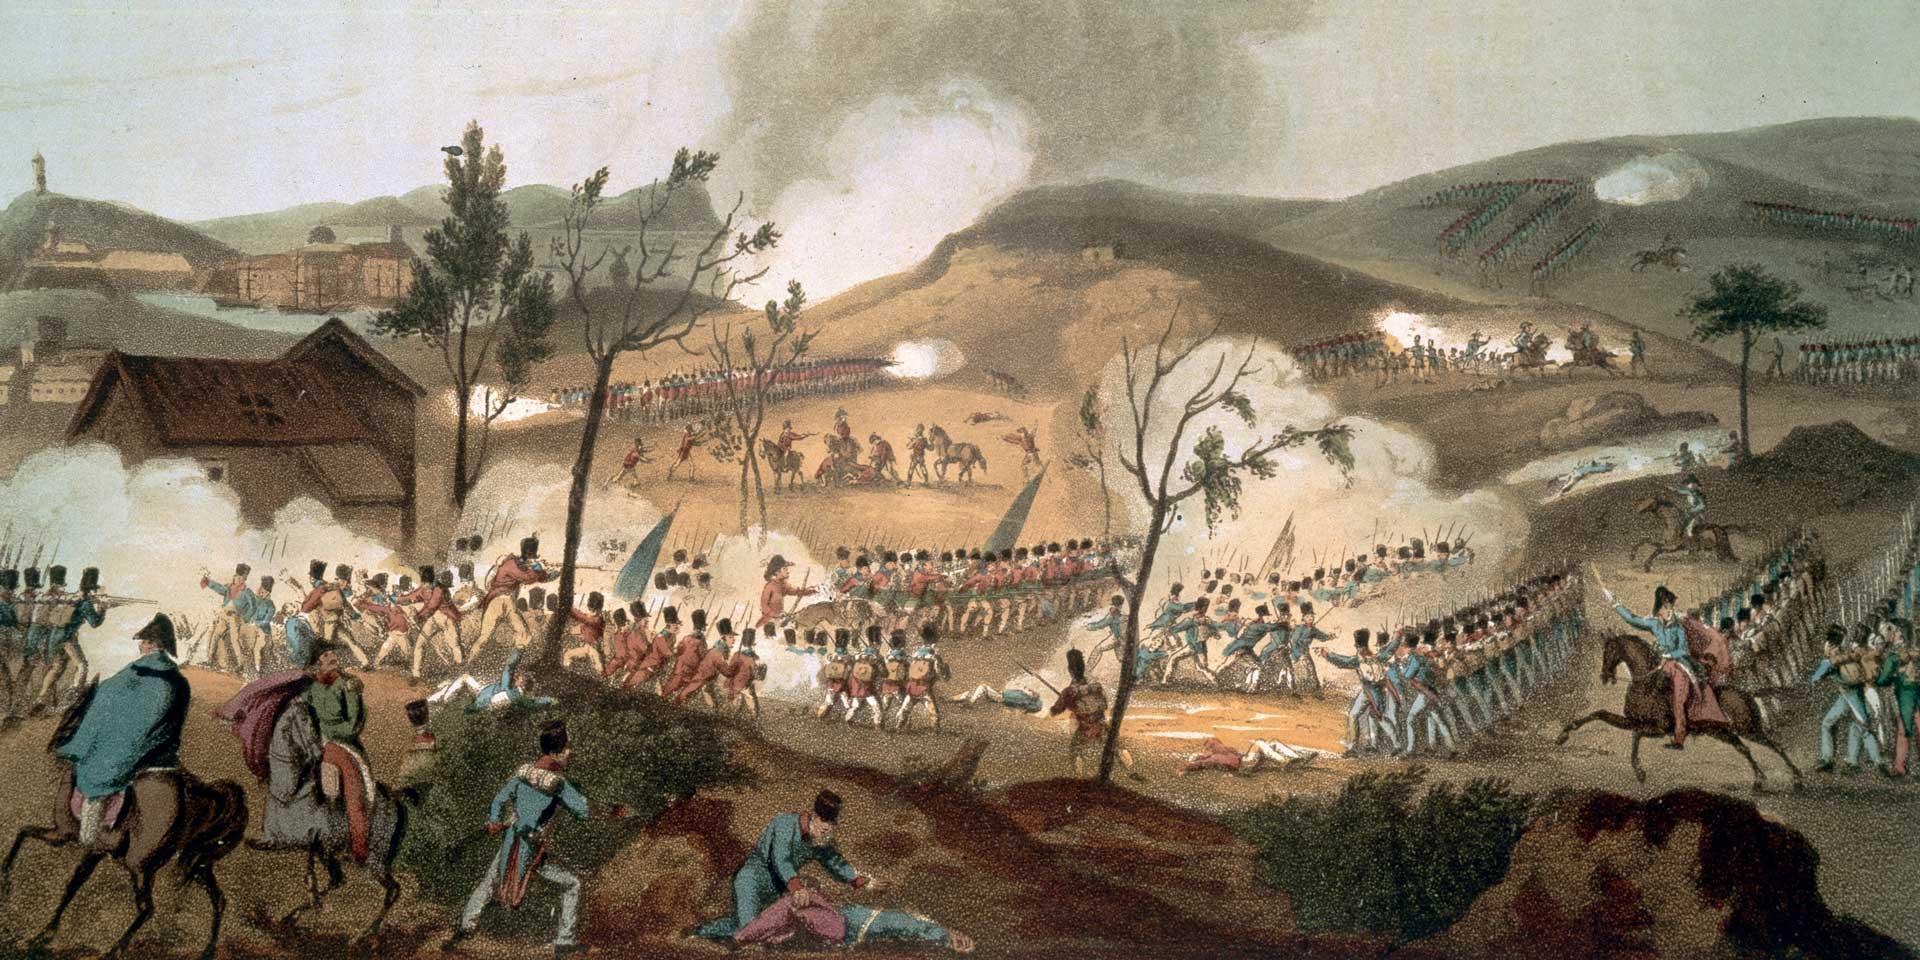 The Battle of Corunna, 16 January 1809